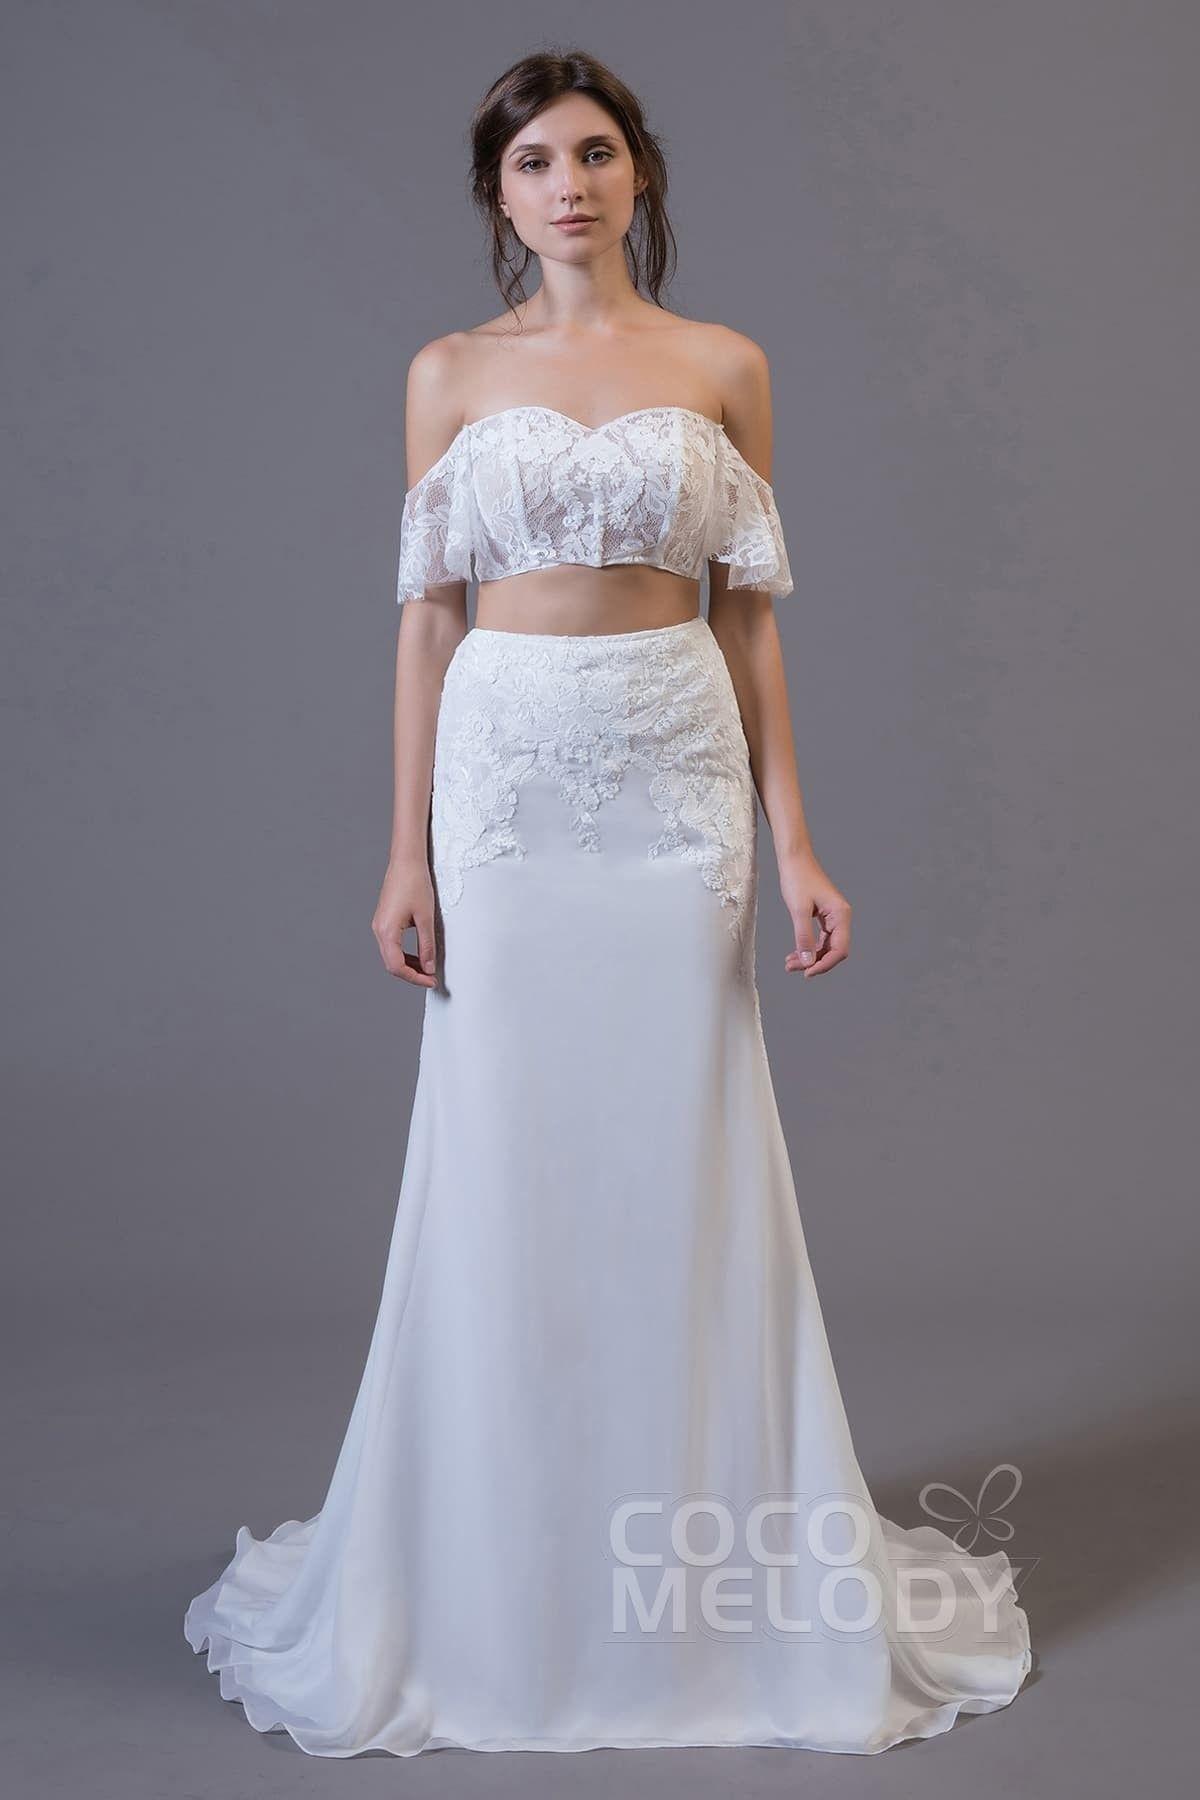 Crop top sweepbrush train tulle and chiffon wedding dress ld